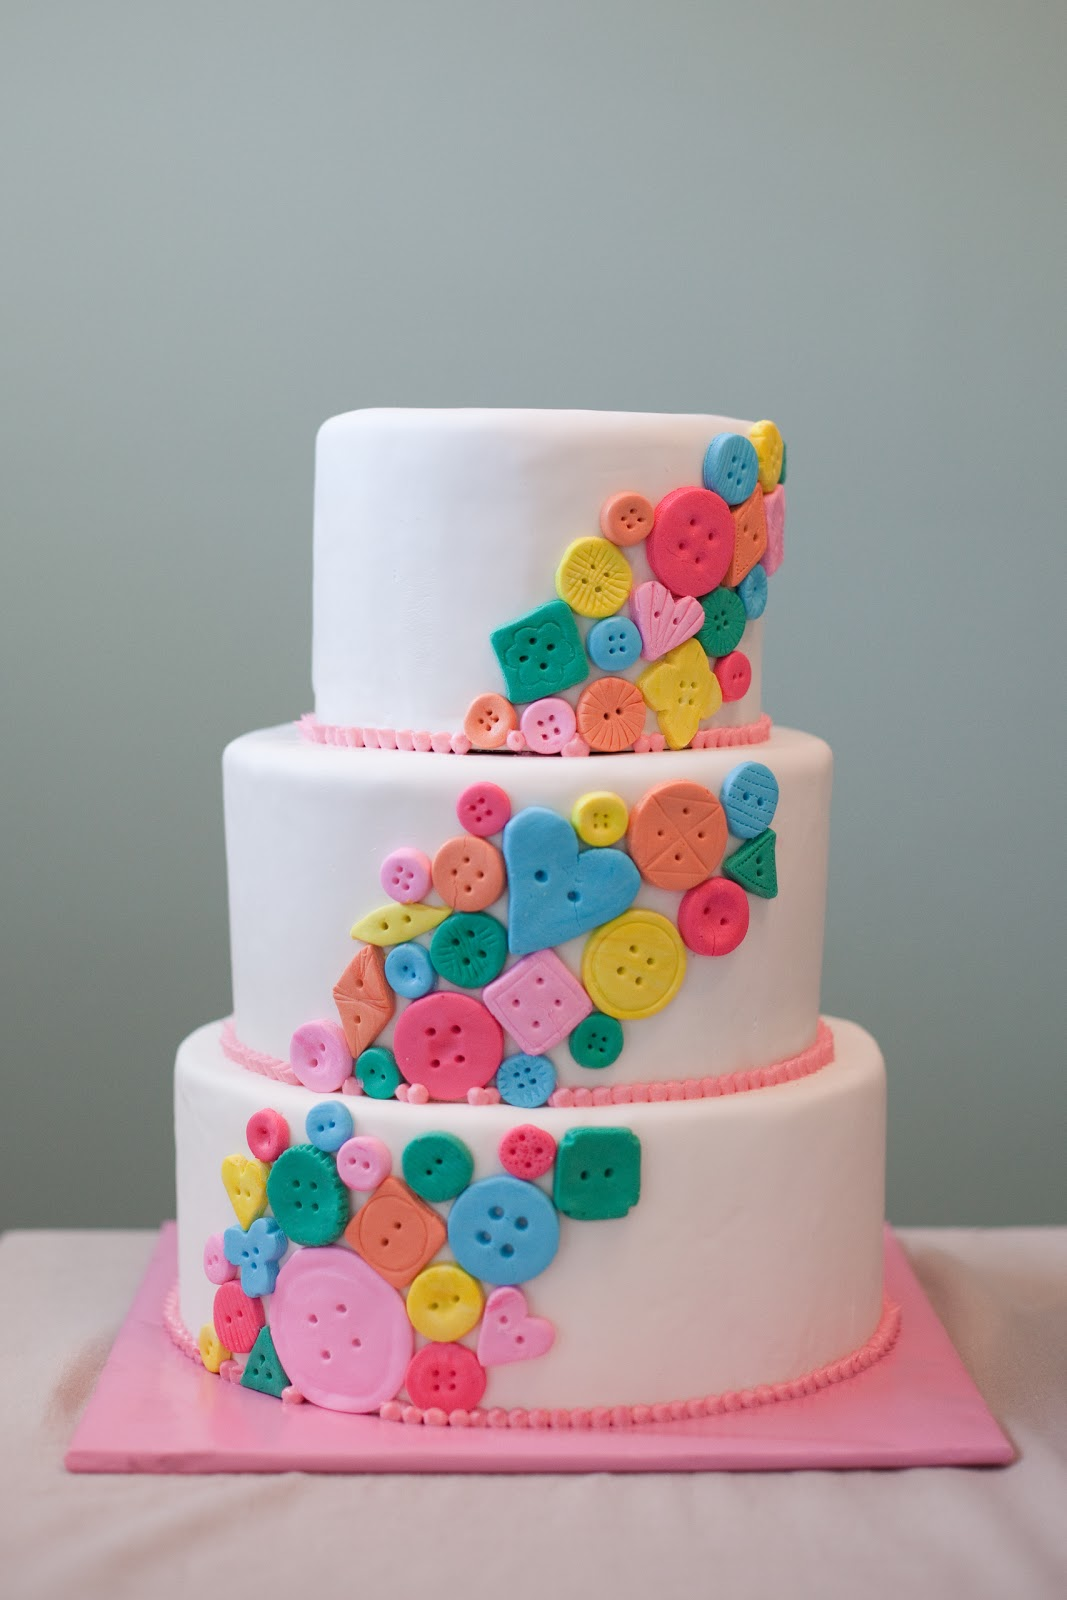 Pin by Rachel Christine on My Own Cakes | Birthday cake